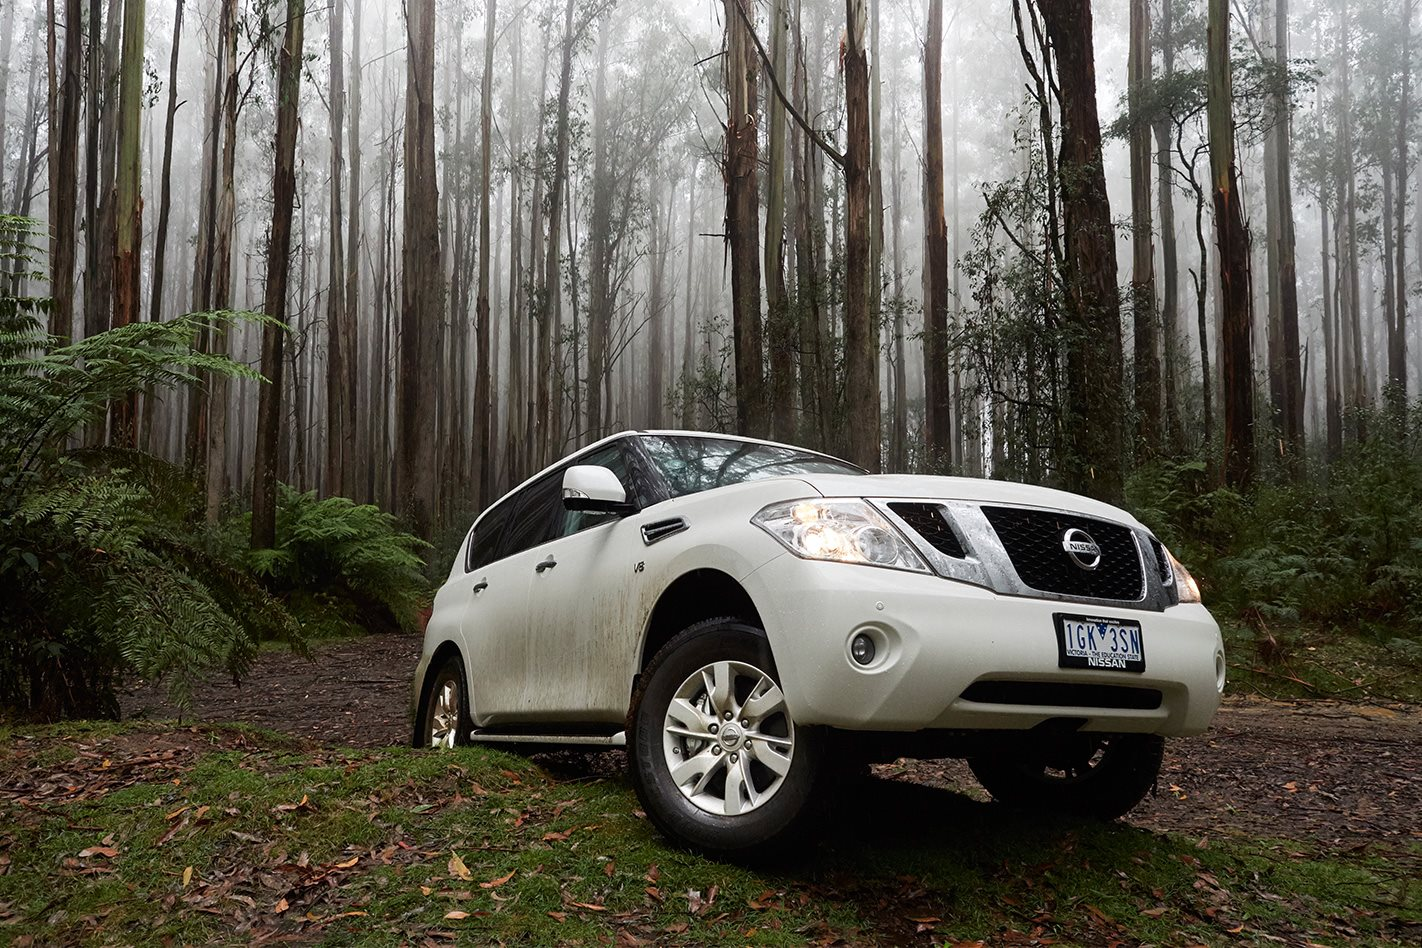 2020 Nissan Patrol Royale, Ute, Y62 >> Y62 Nissan Patrol Ti Review